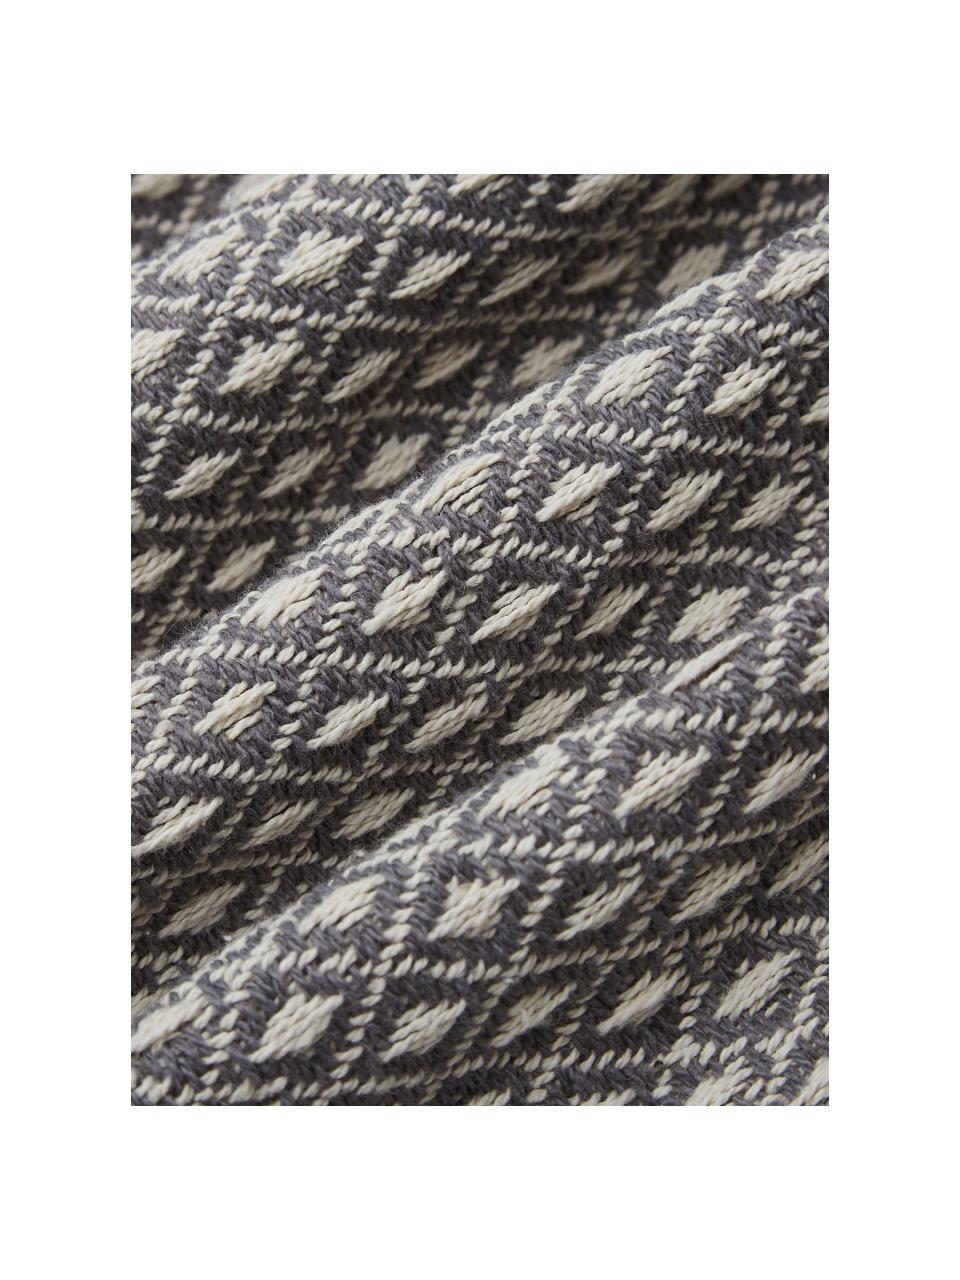 Gemustertes Plaid Lilano mit Pompoms, 100% Baumwolle, Beige, Grau, 130 x 150 cm